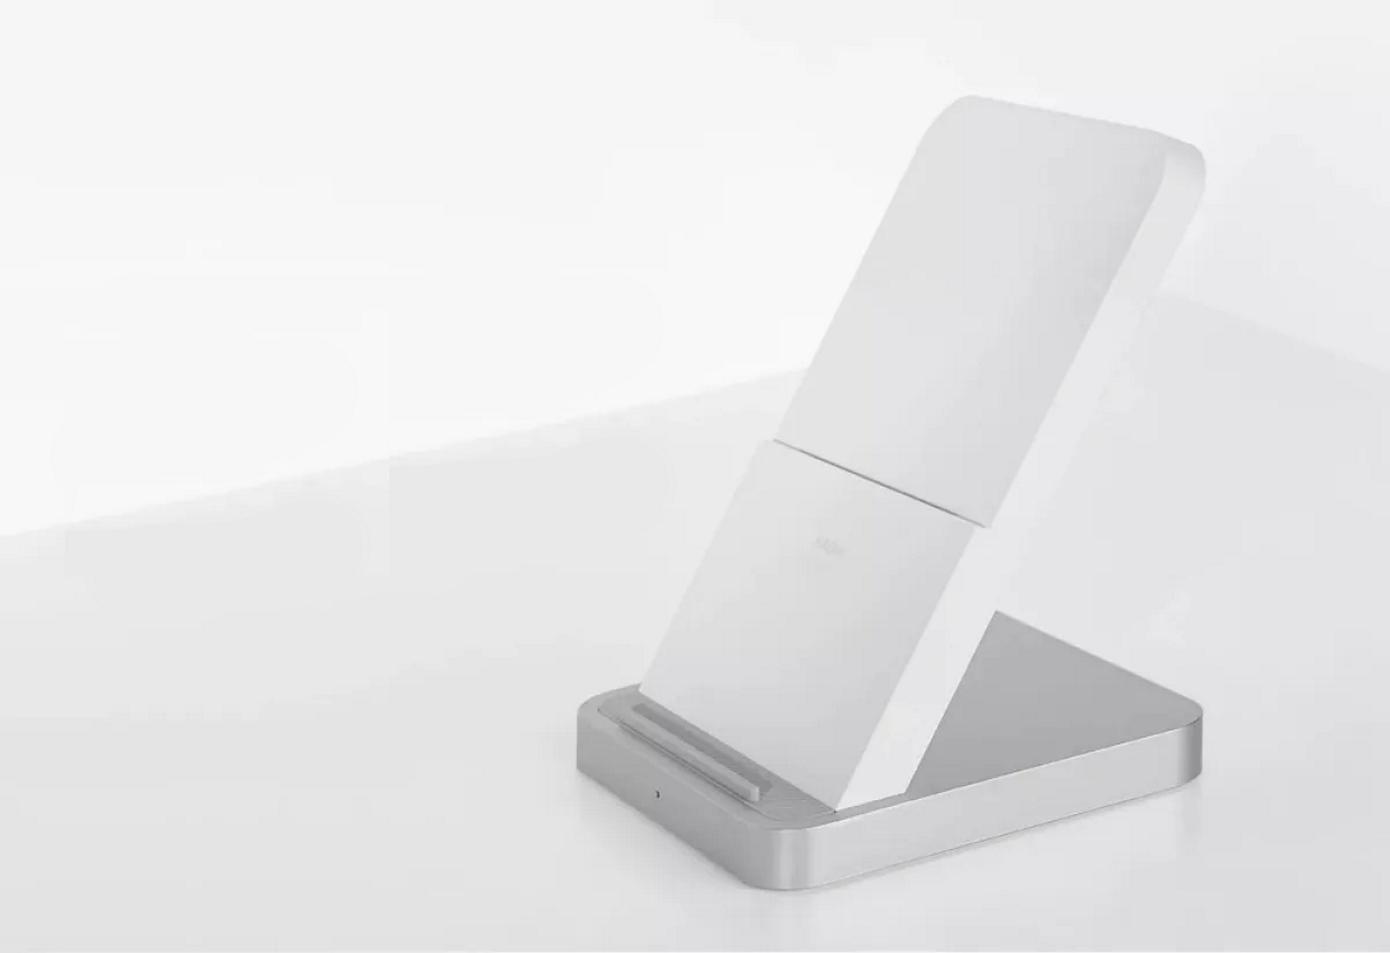 Opisanie Besprovodnoe Zaryadnoe Ustrojstvo Xiaomi Vertical Air Cooled Wireless Charger 30w Mdy 11 Eg 1